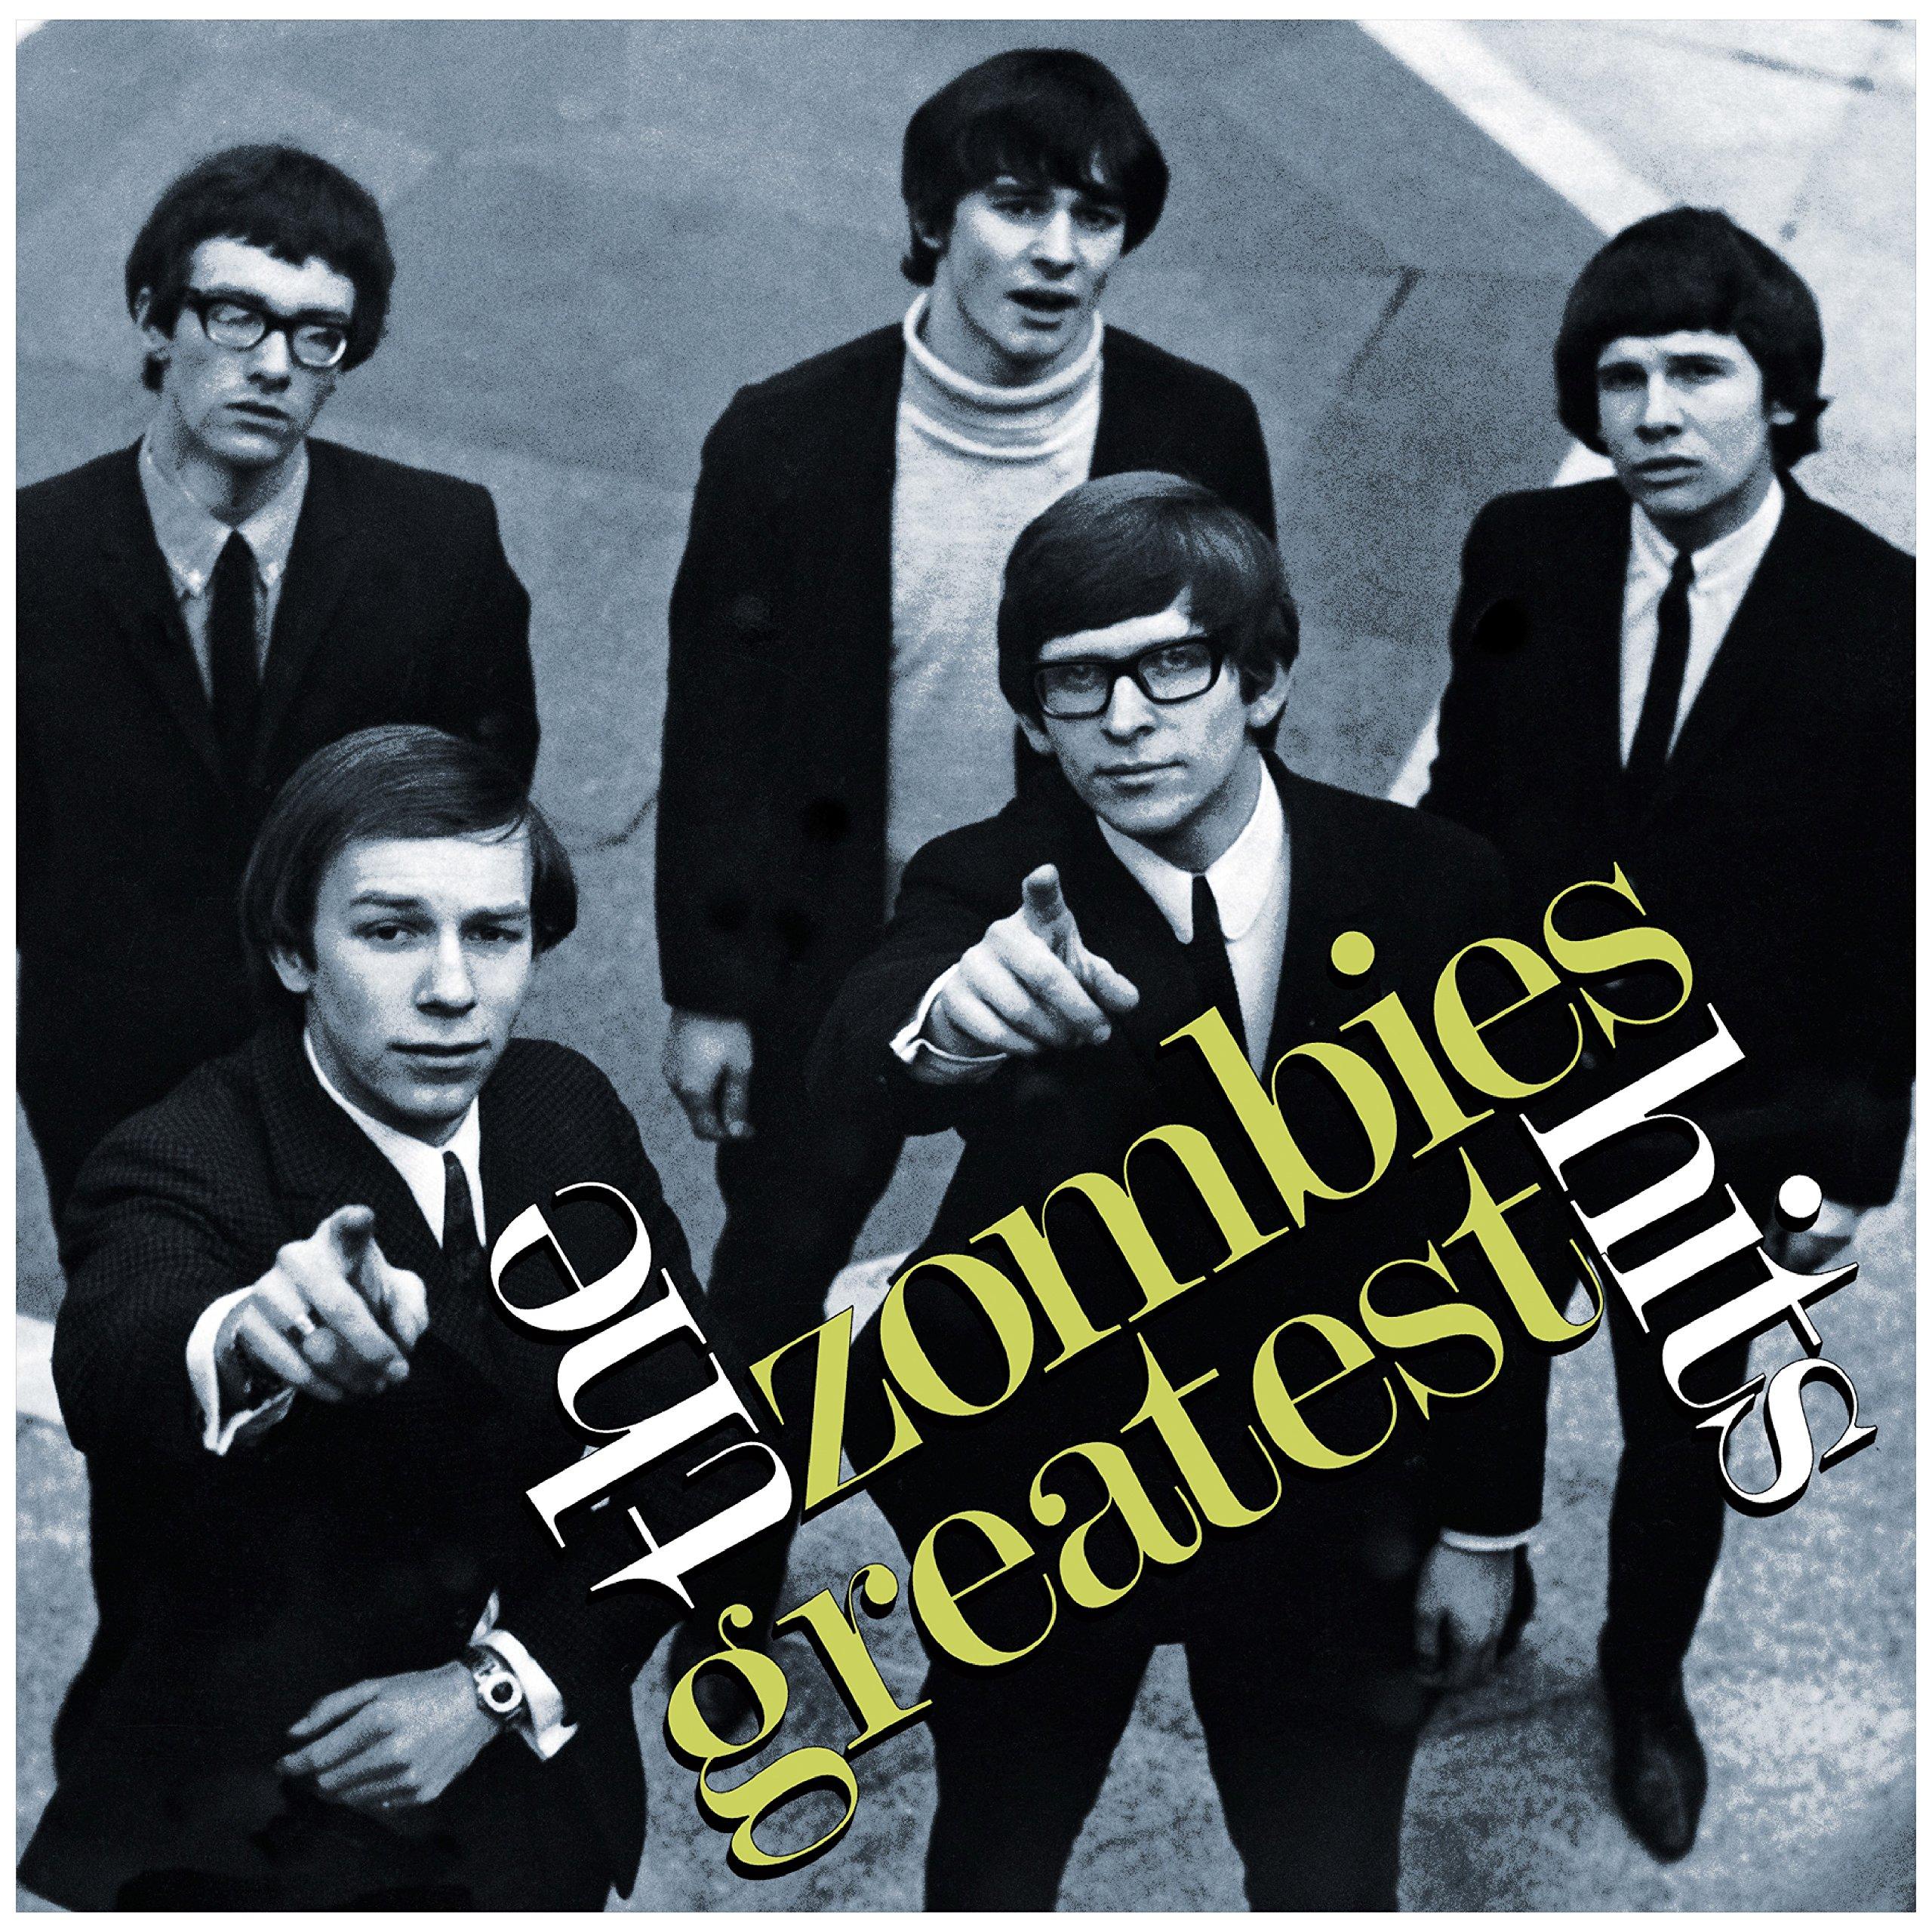 Vinilo : The Zombies - Greatest Hits (LP Vinyl)